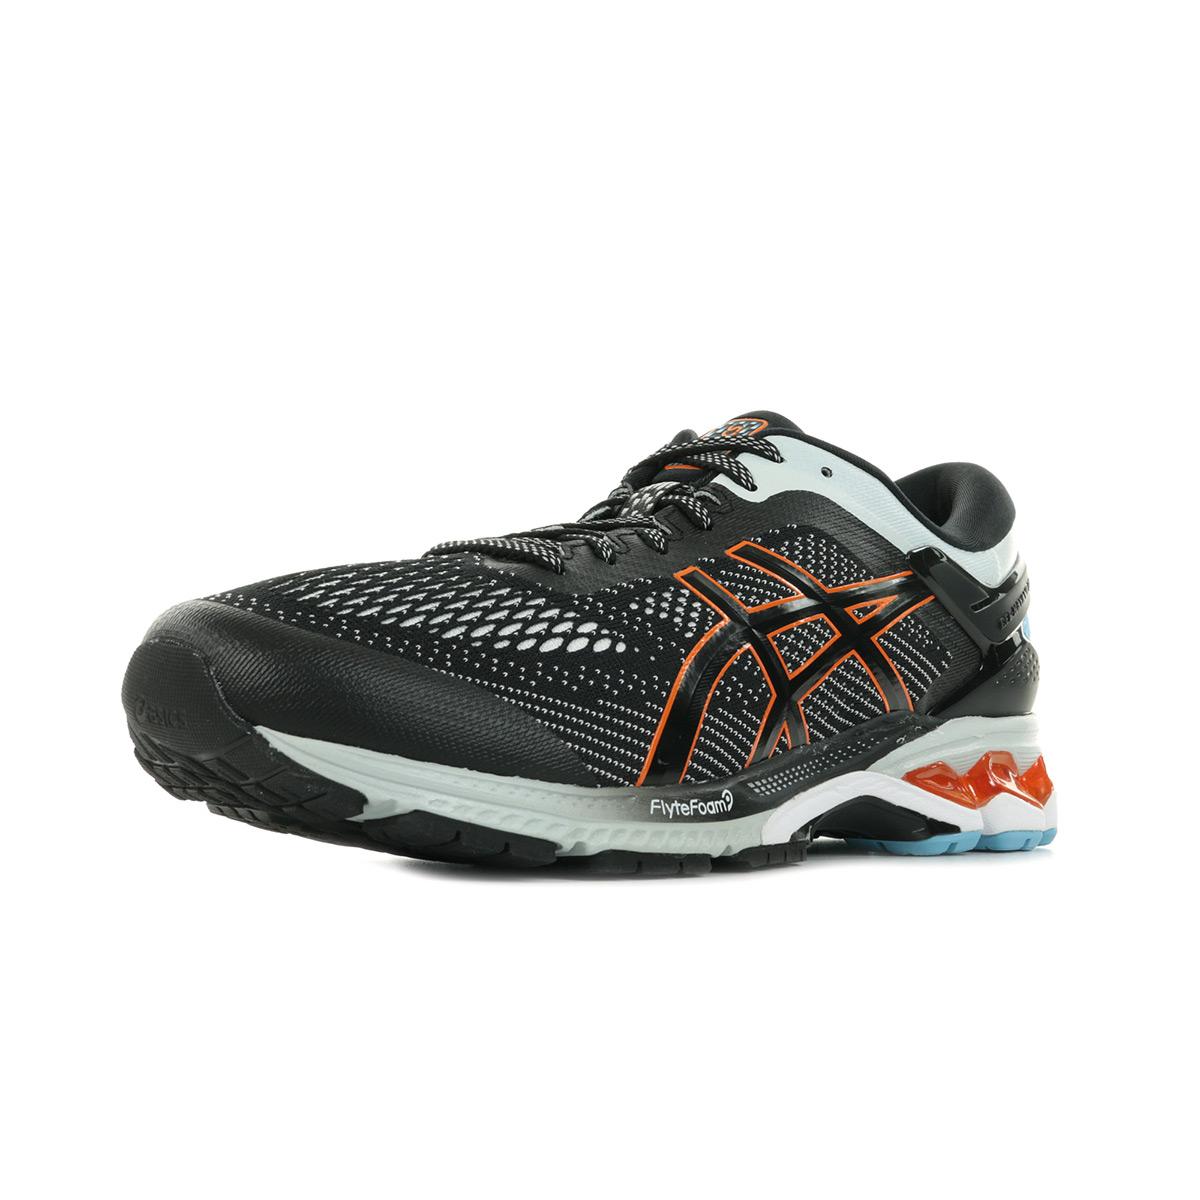 Details zu Schuhe Asics Herren Gel Kayano 26 Laufschuhe Running schwarz